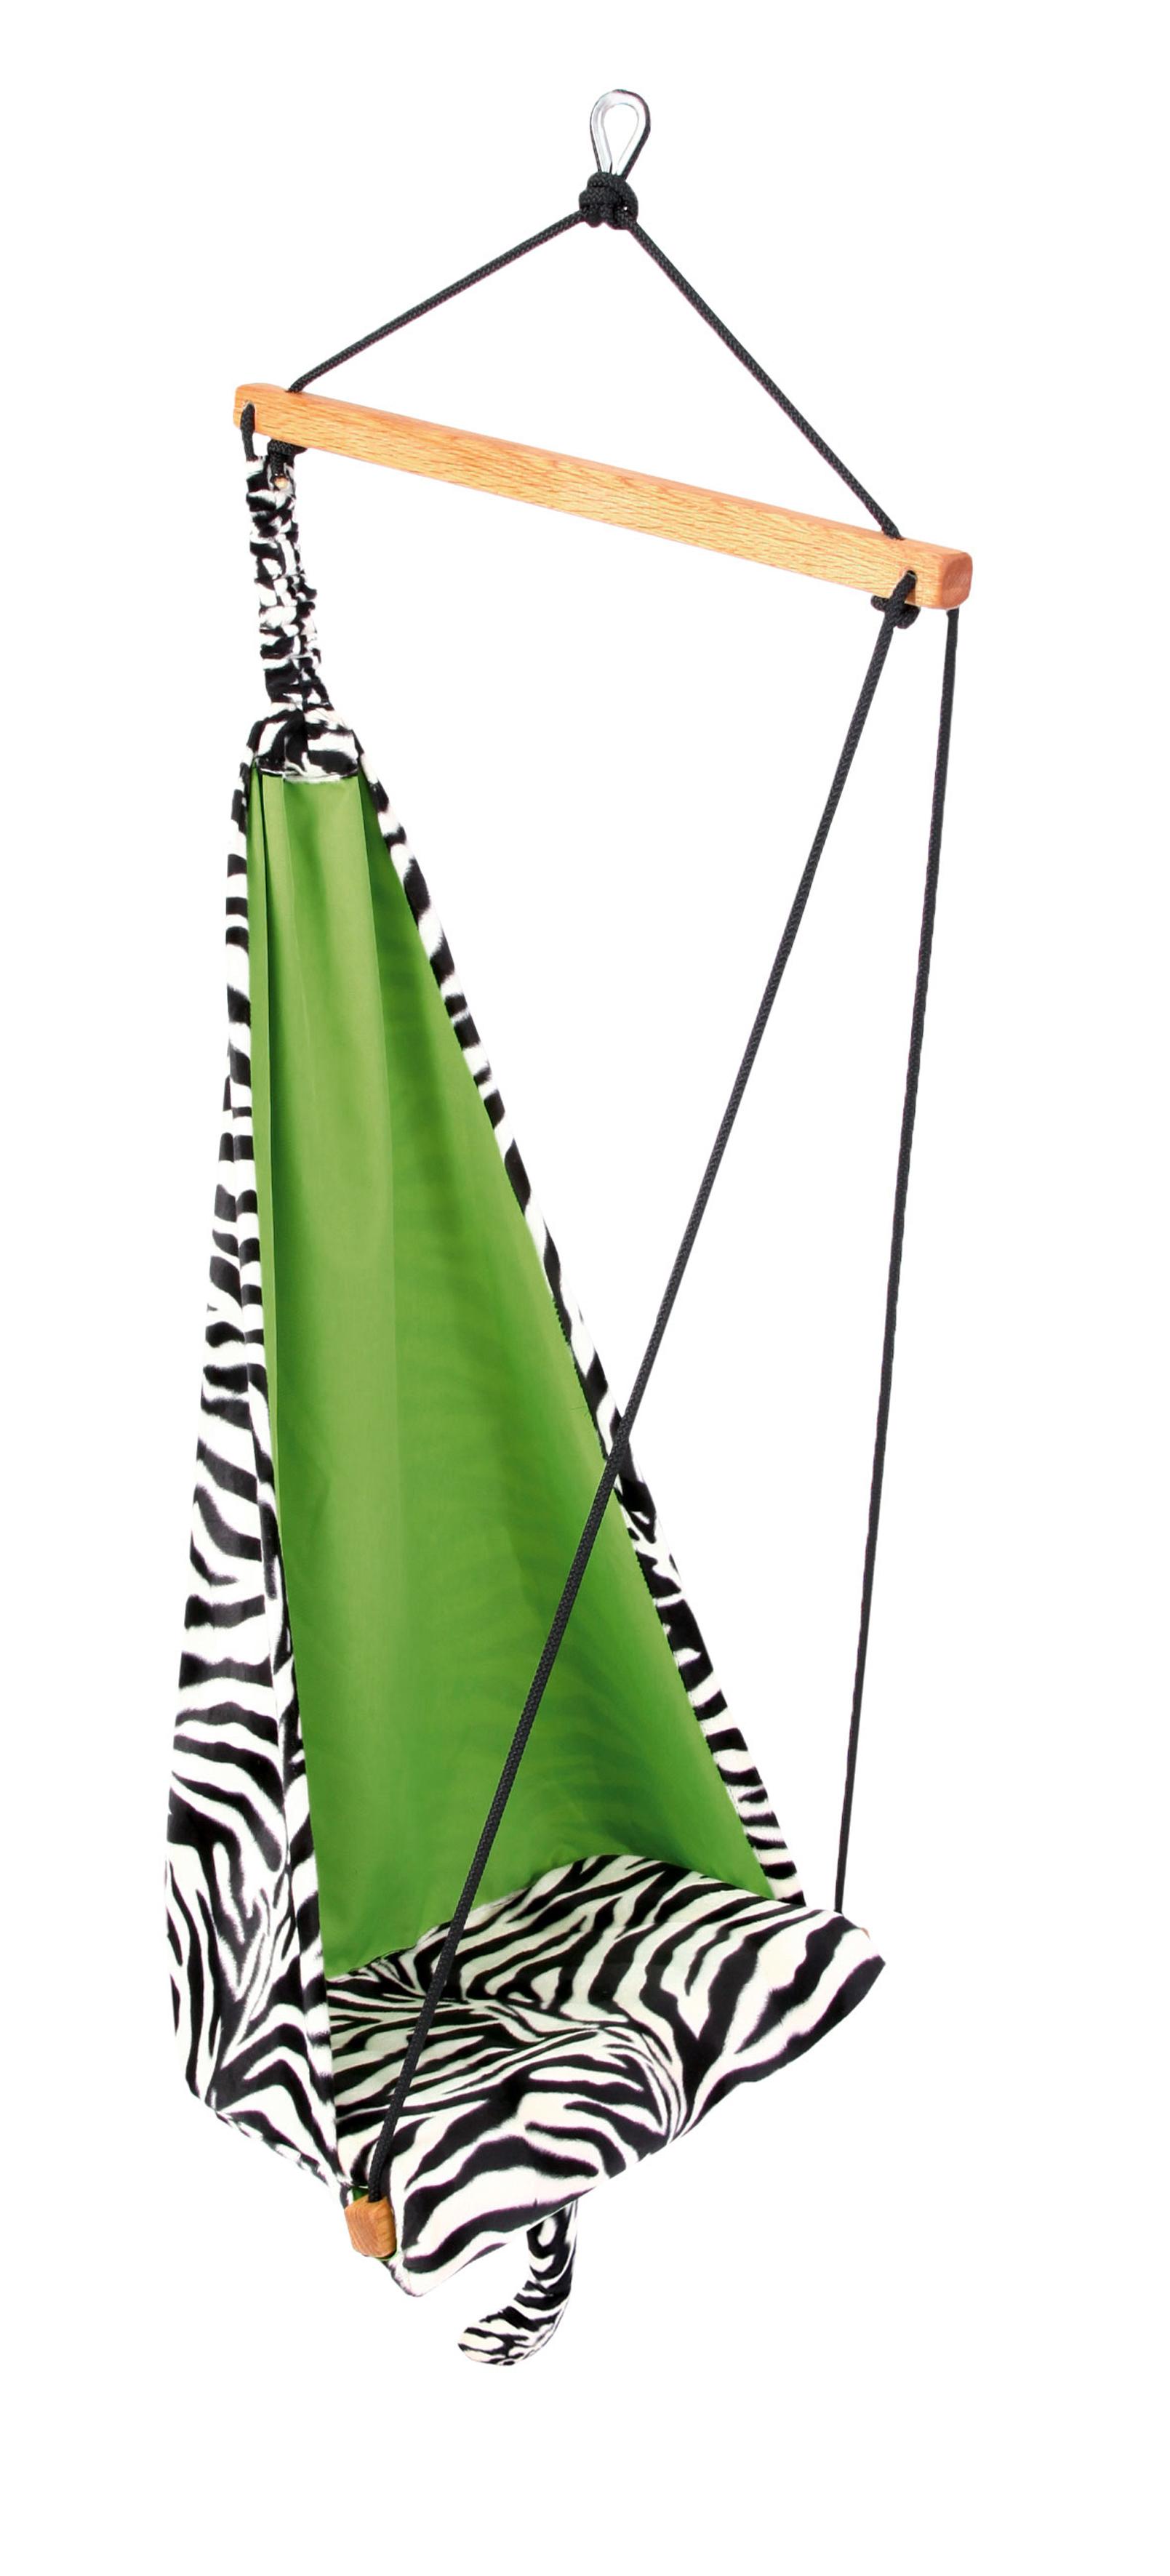 Kinderhangstoel 'Hang Mini' Zebra - Groen - Amazonas